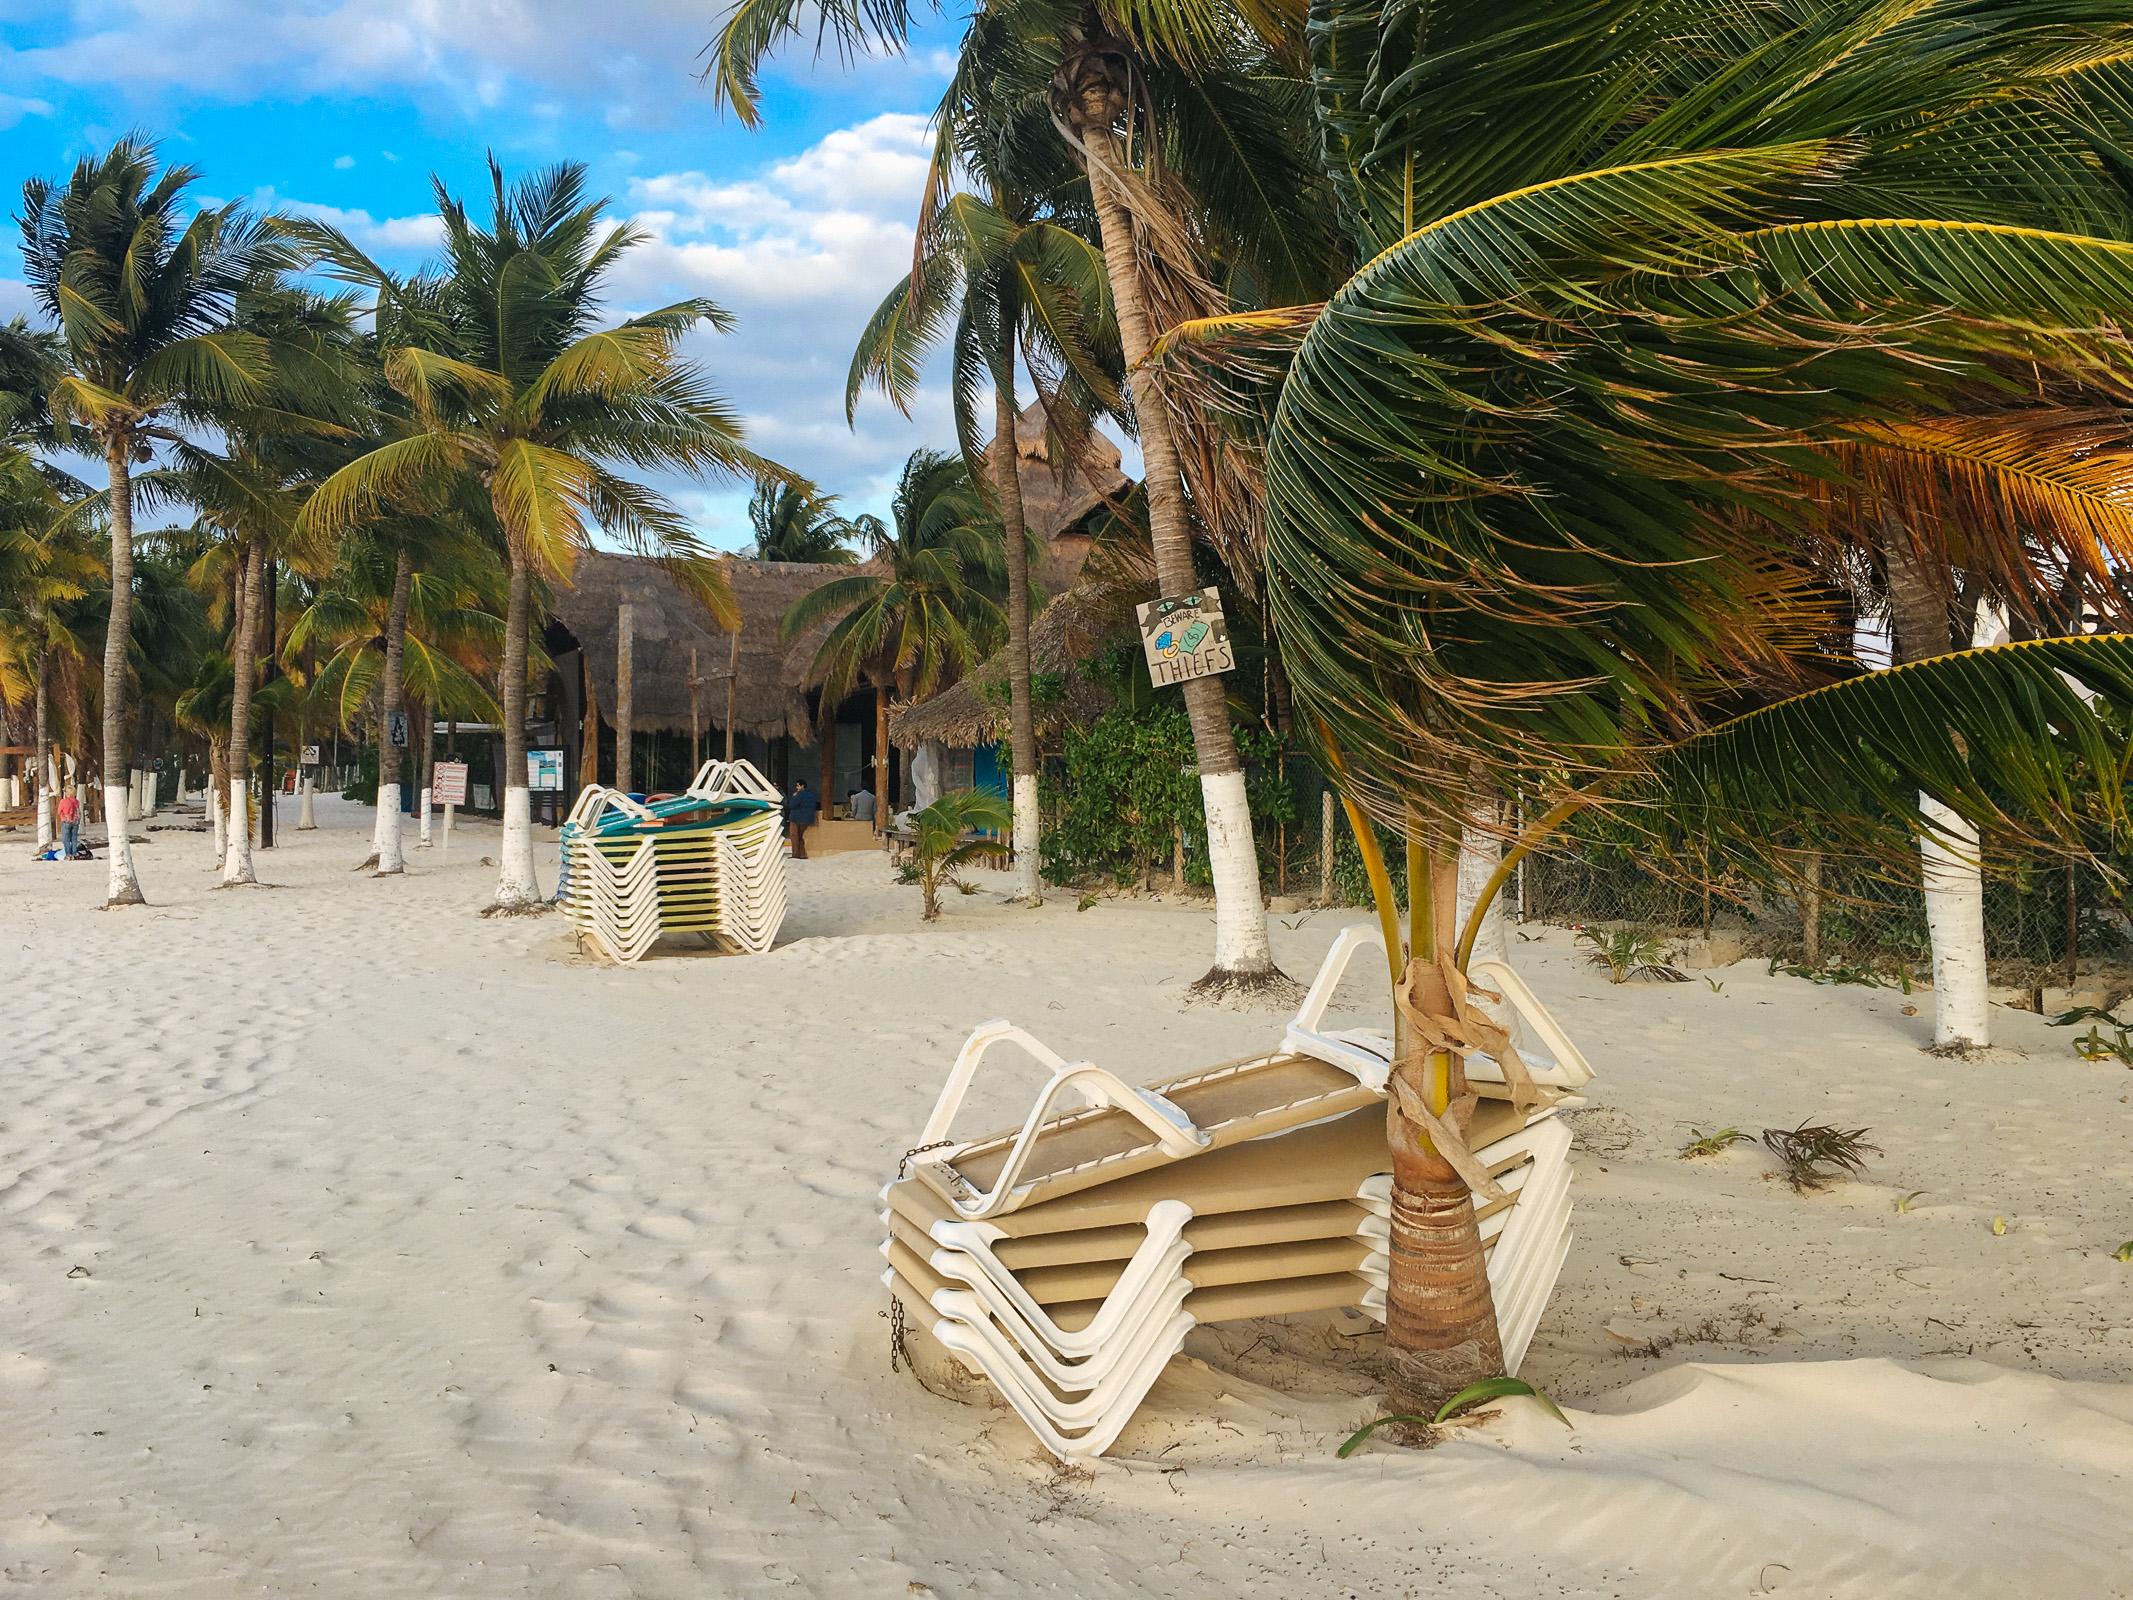 Blick auf Strandrestaurant Buho